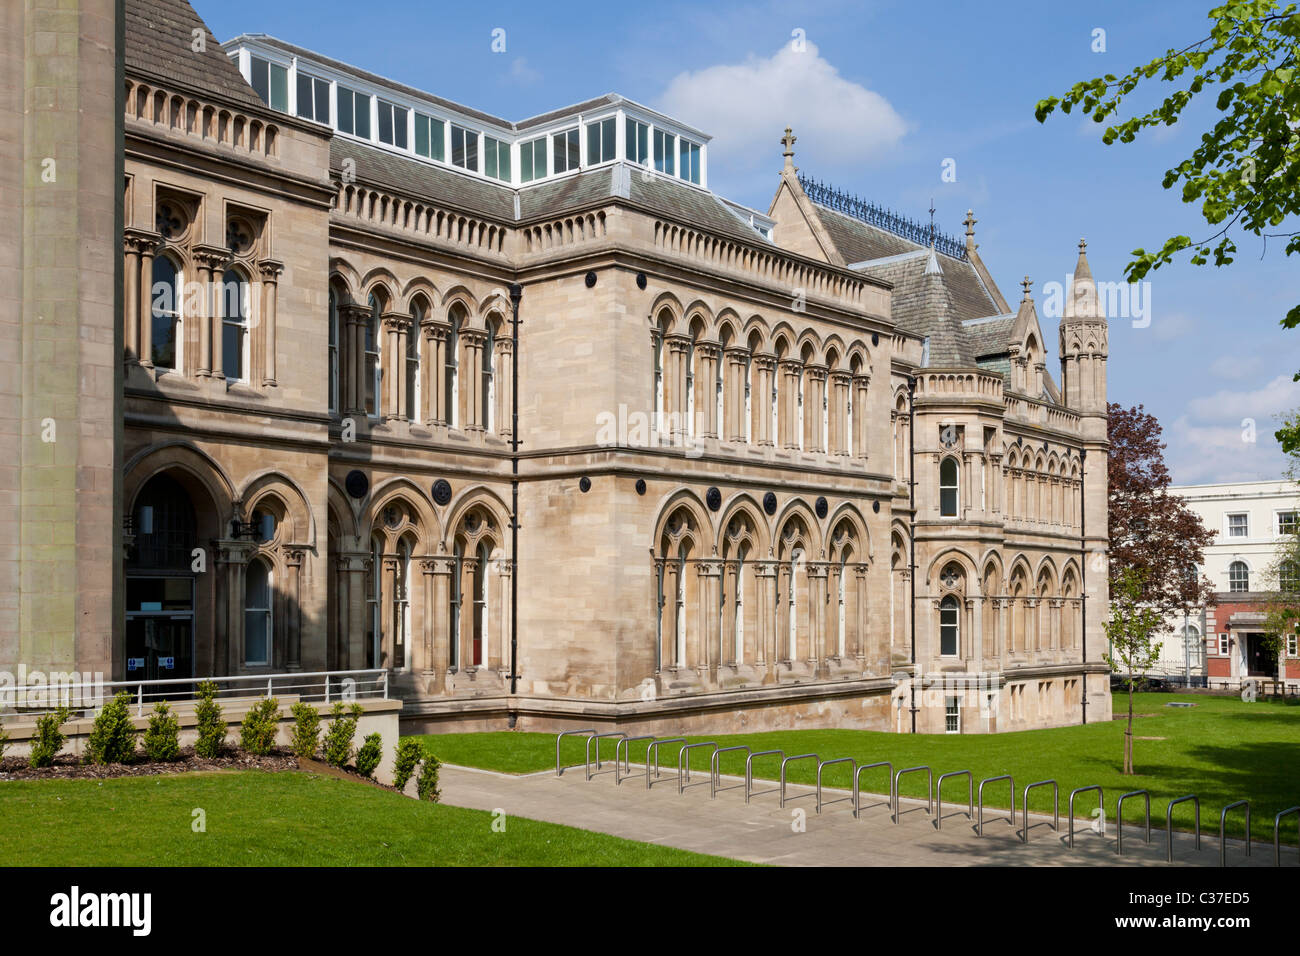 Newton e Arkwright edifici Nottingham Trent University, Nottingham, Regno Unito Immagini Stock